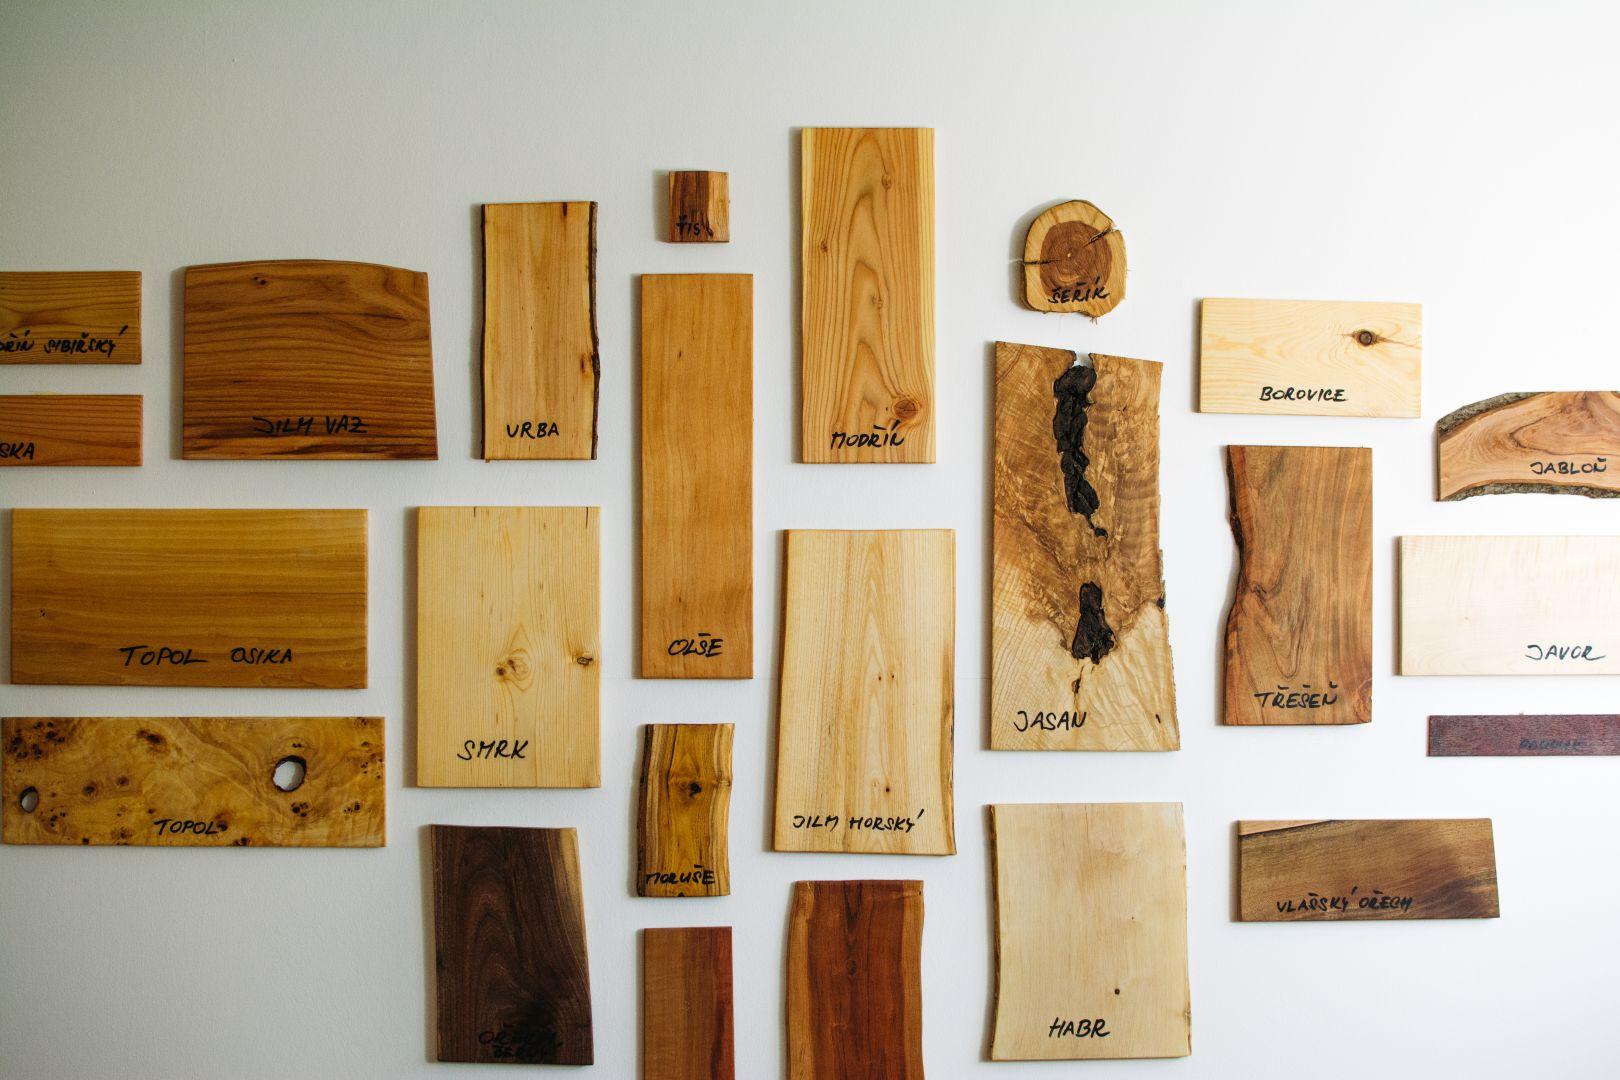 Obrázek 3 - dřevo